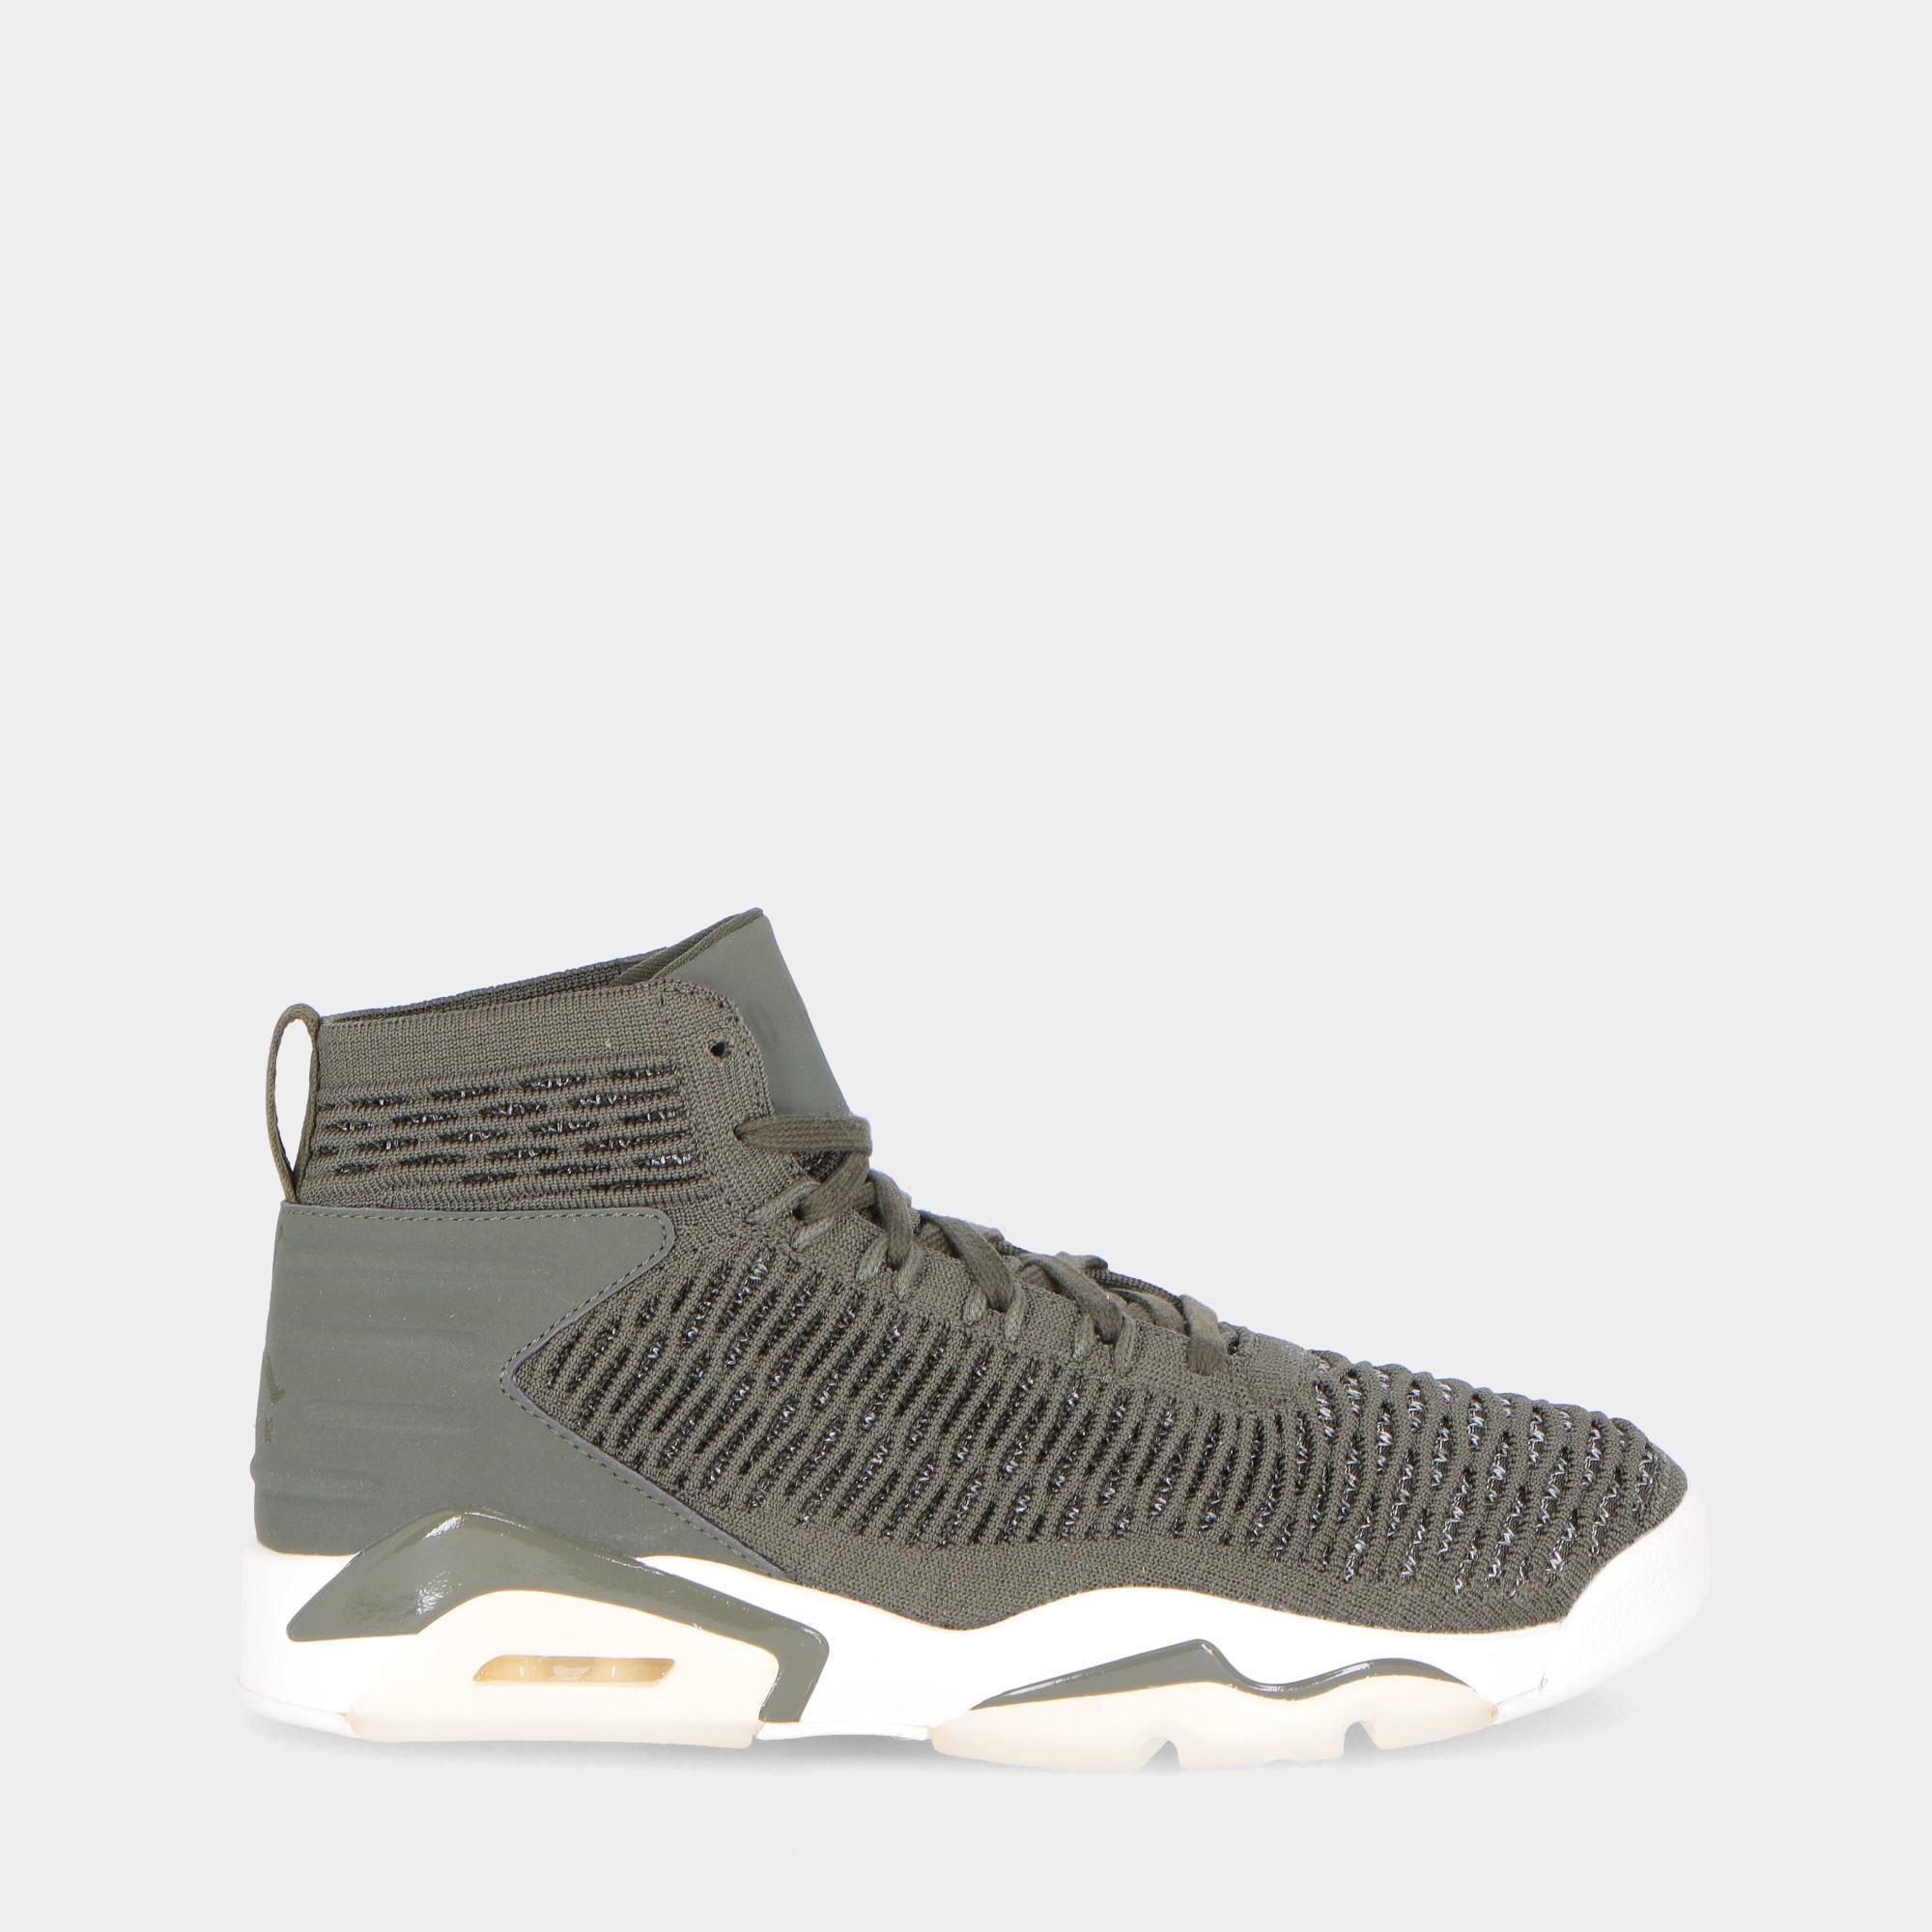 premium selection 093dc 50f86 Nike Jordan Flyknit Elevation 23 Khaki khaki